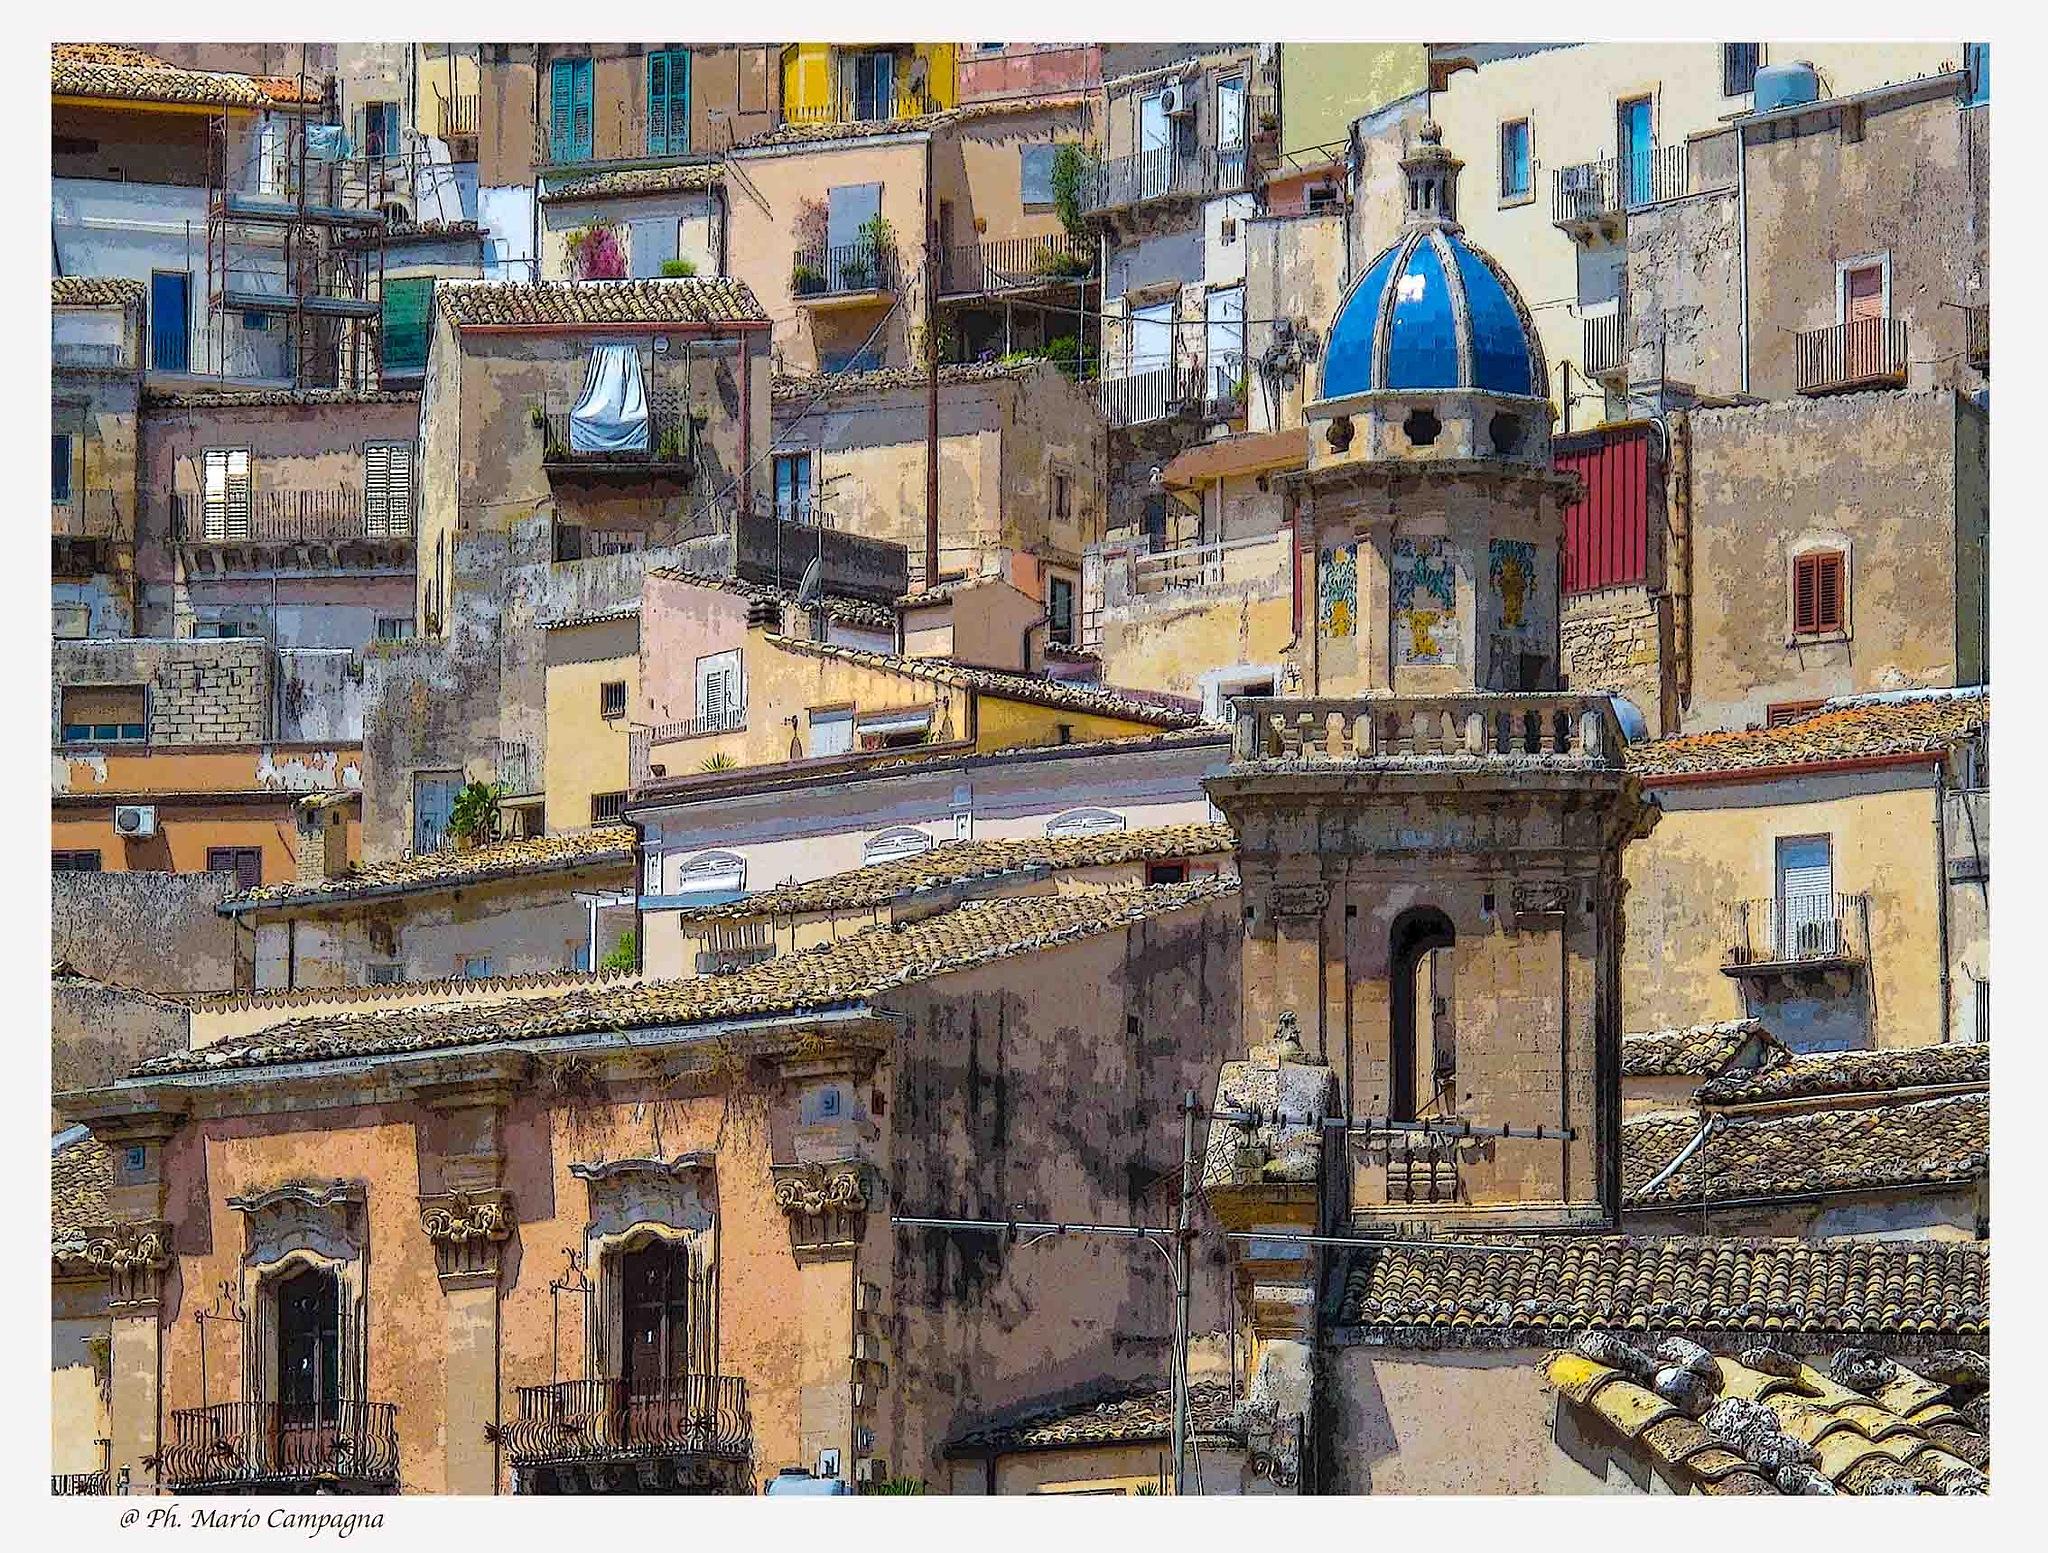 Ragusa Ibla - Sicily by mario campagna